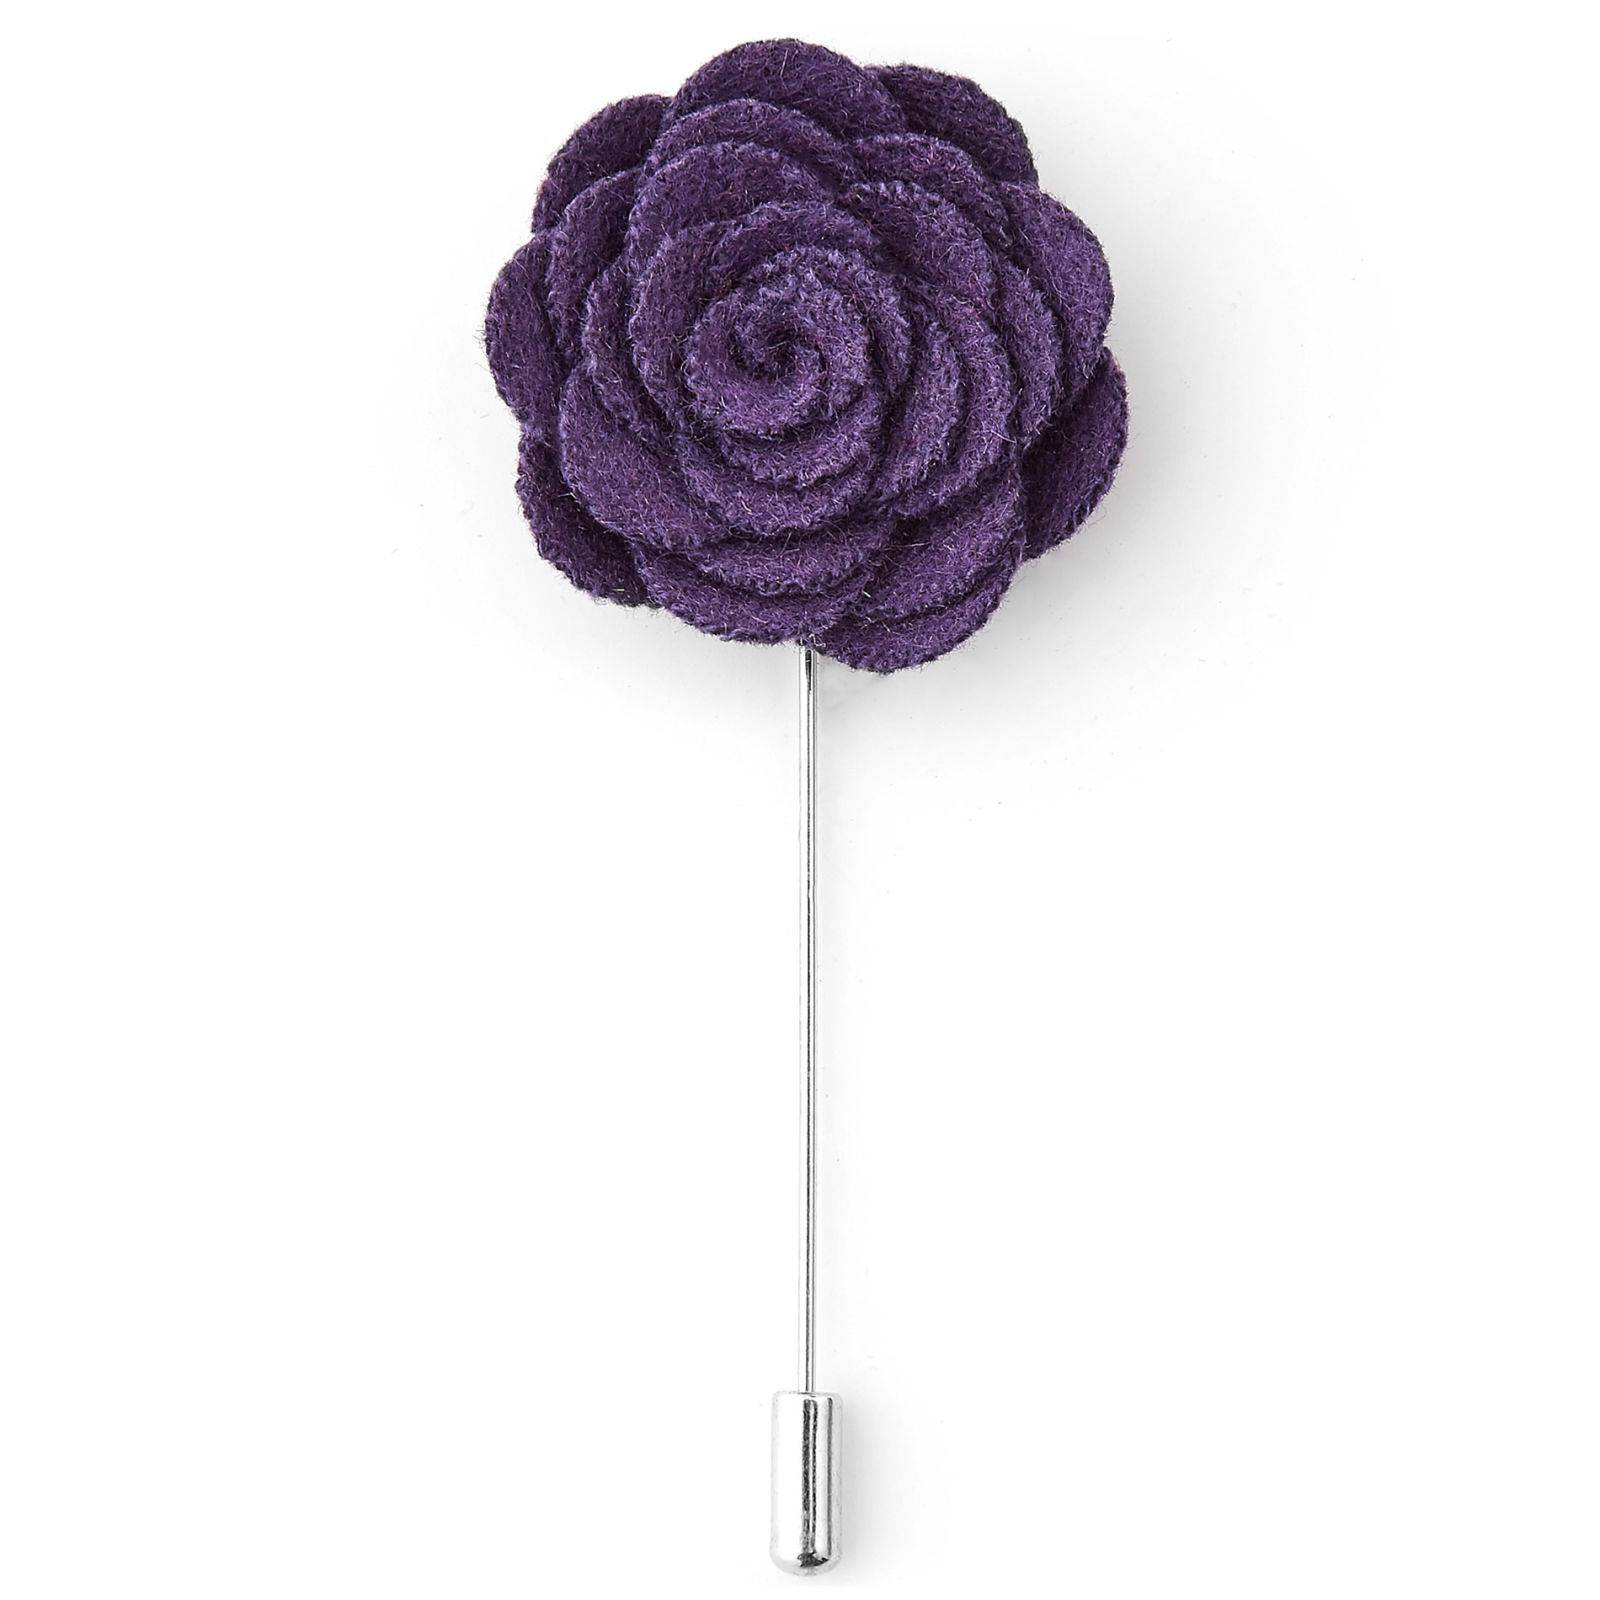 Warren Asher Violetti ruusu -rintaneula